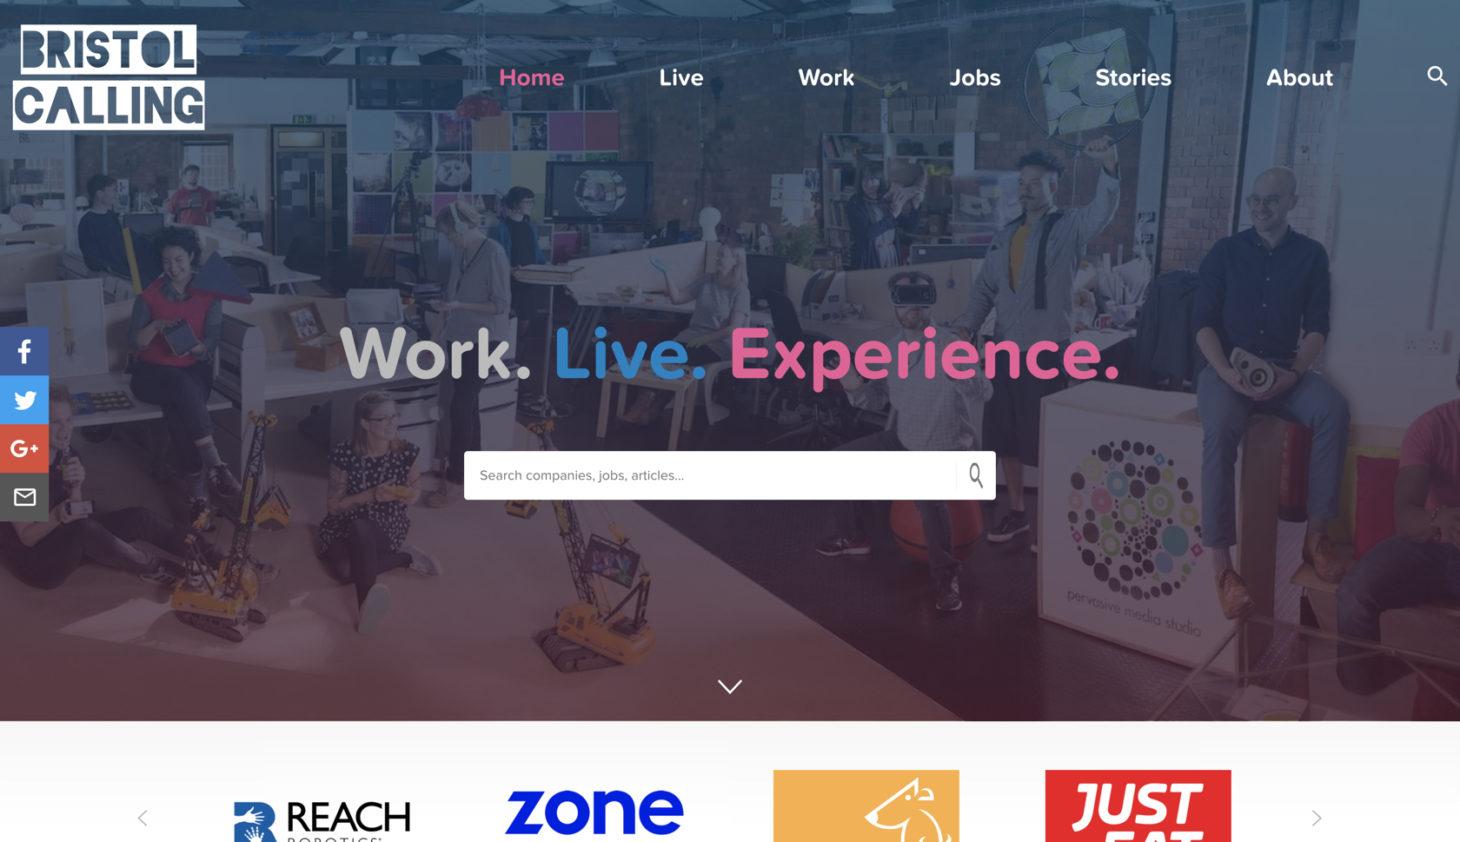 Captivating WordPress Web Design Bath, Web Development, ECommerce, Membership Sites